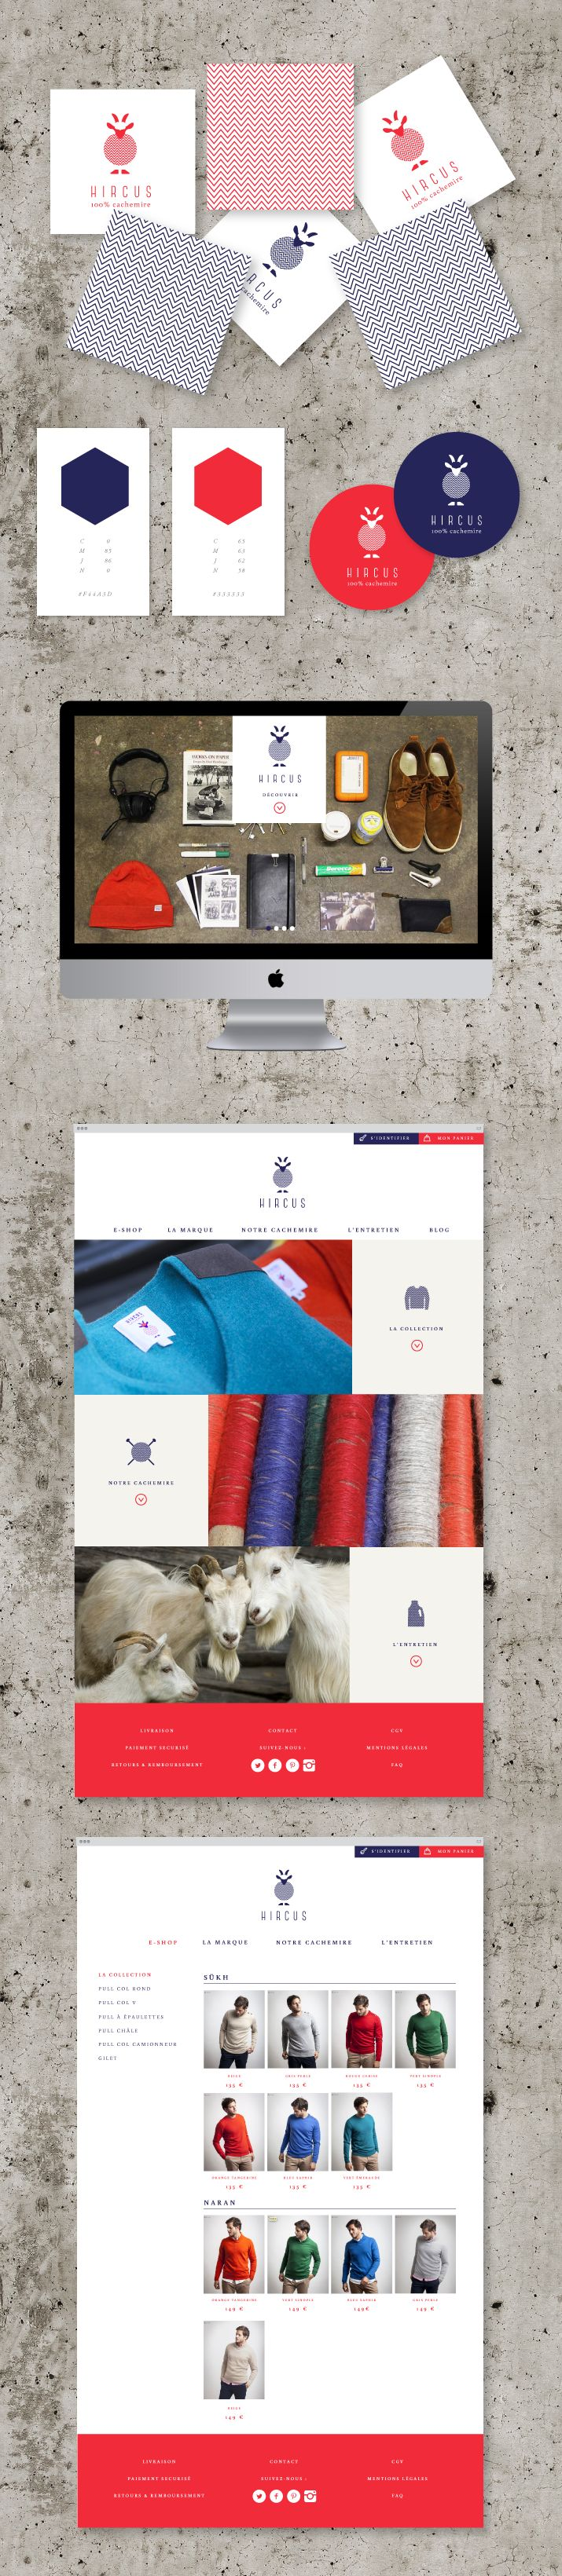 Identité visuelle et design de la marque Hircus #identity #design #graphic